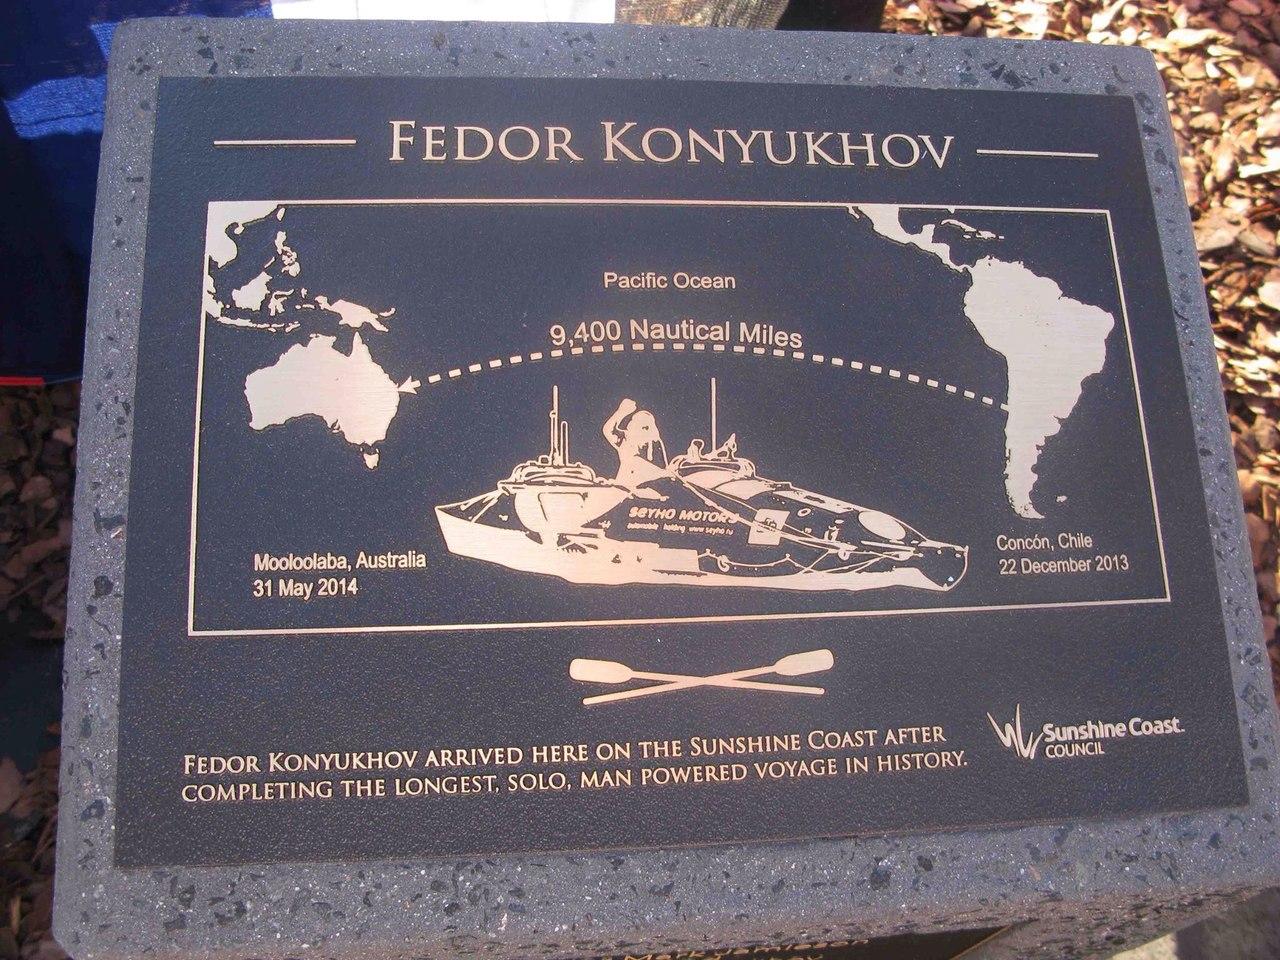 В Австралии увековечили тихоокеанский переход Фёдора Конюхова